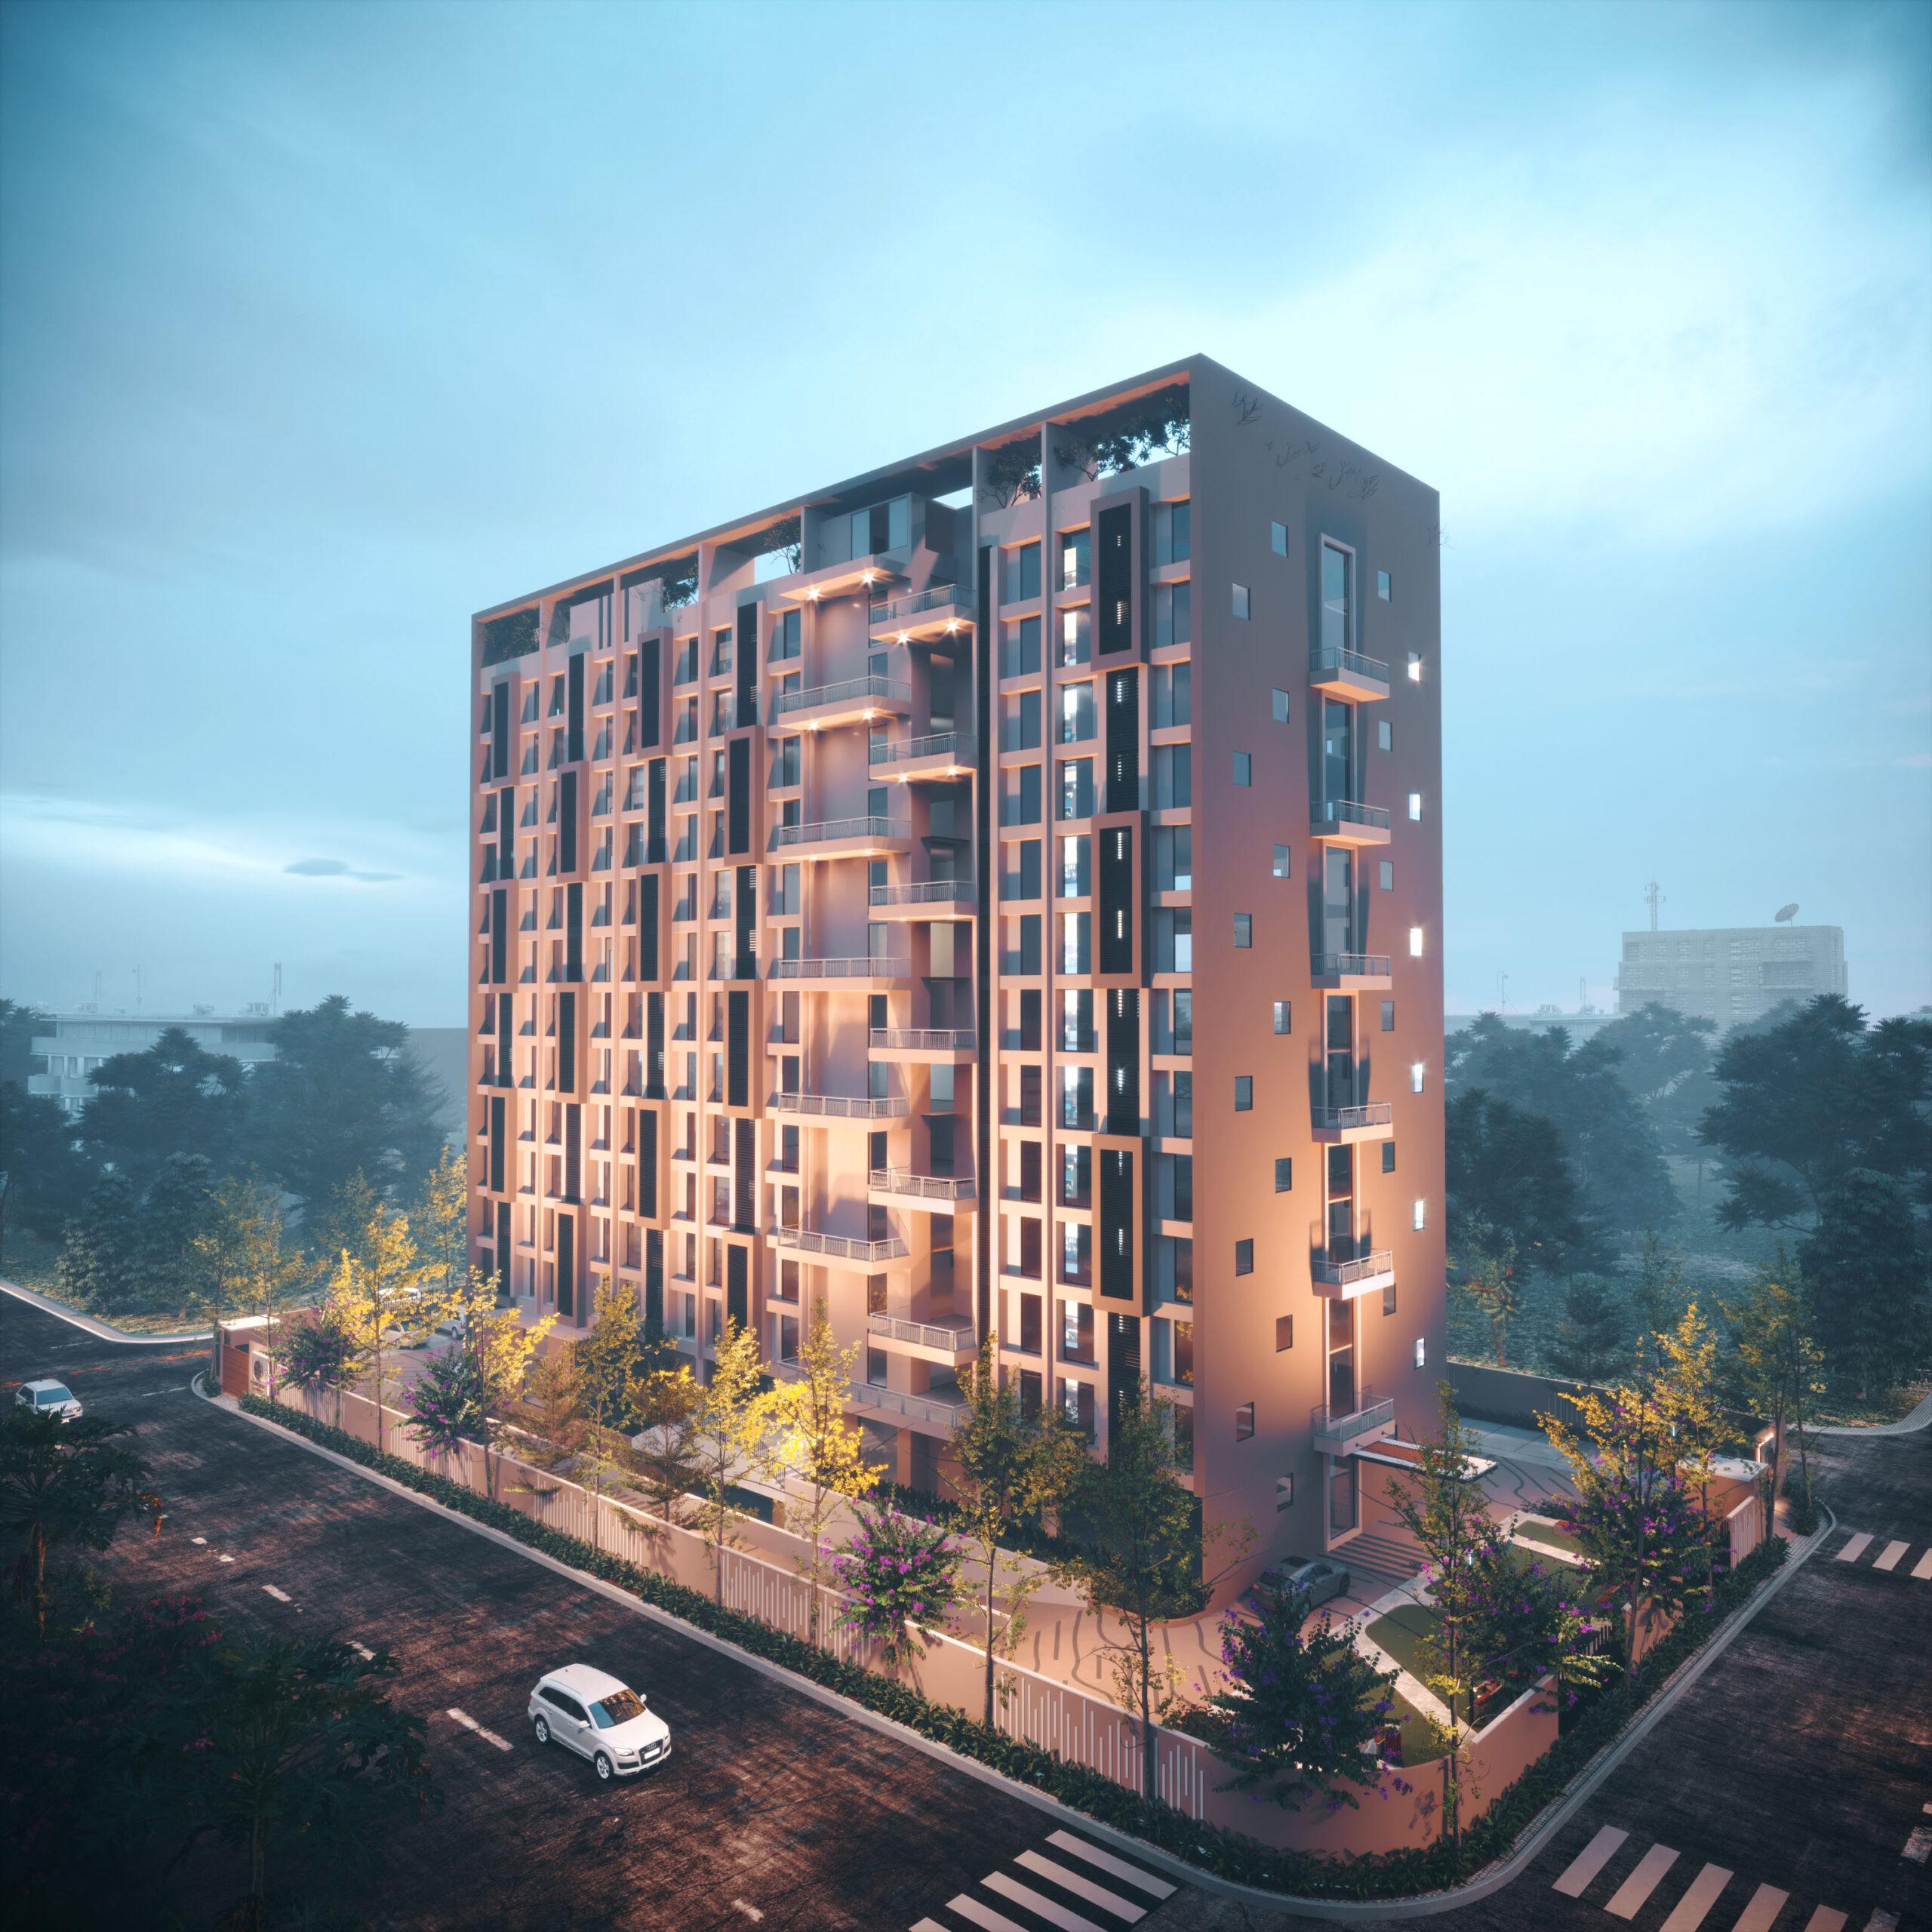 best exterior rendering multi story building night view